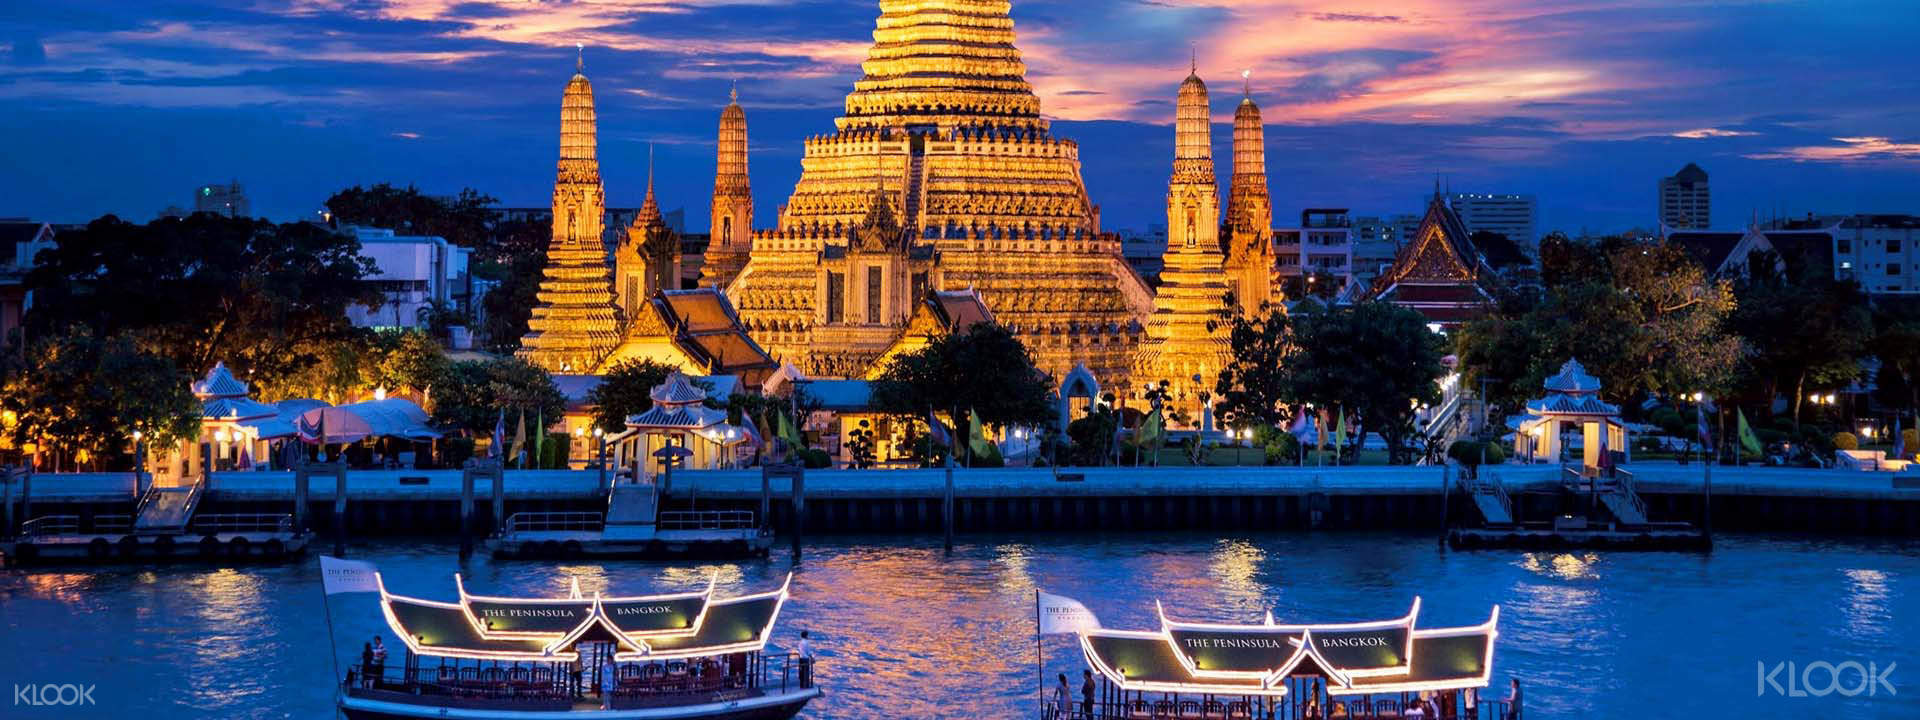 Chao Phraya Princess Cruise - BANGKOK | Klook Travel